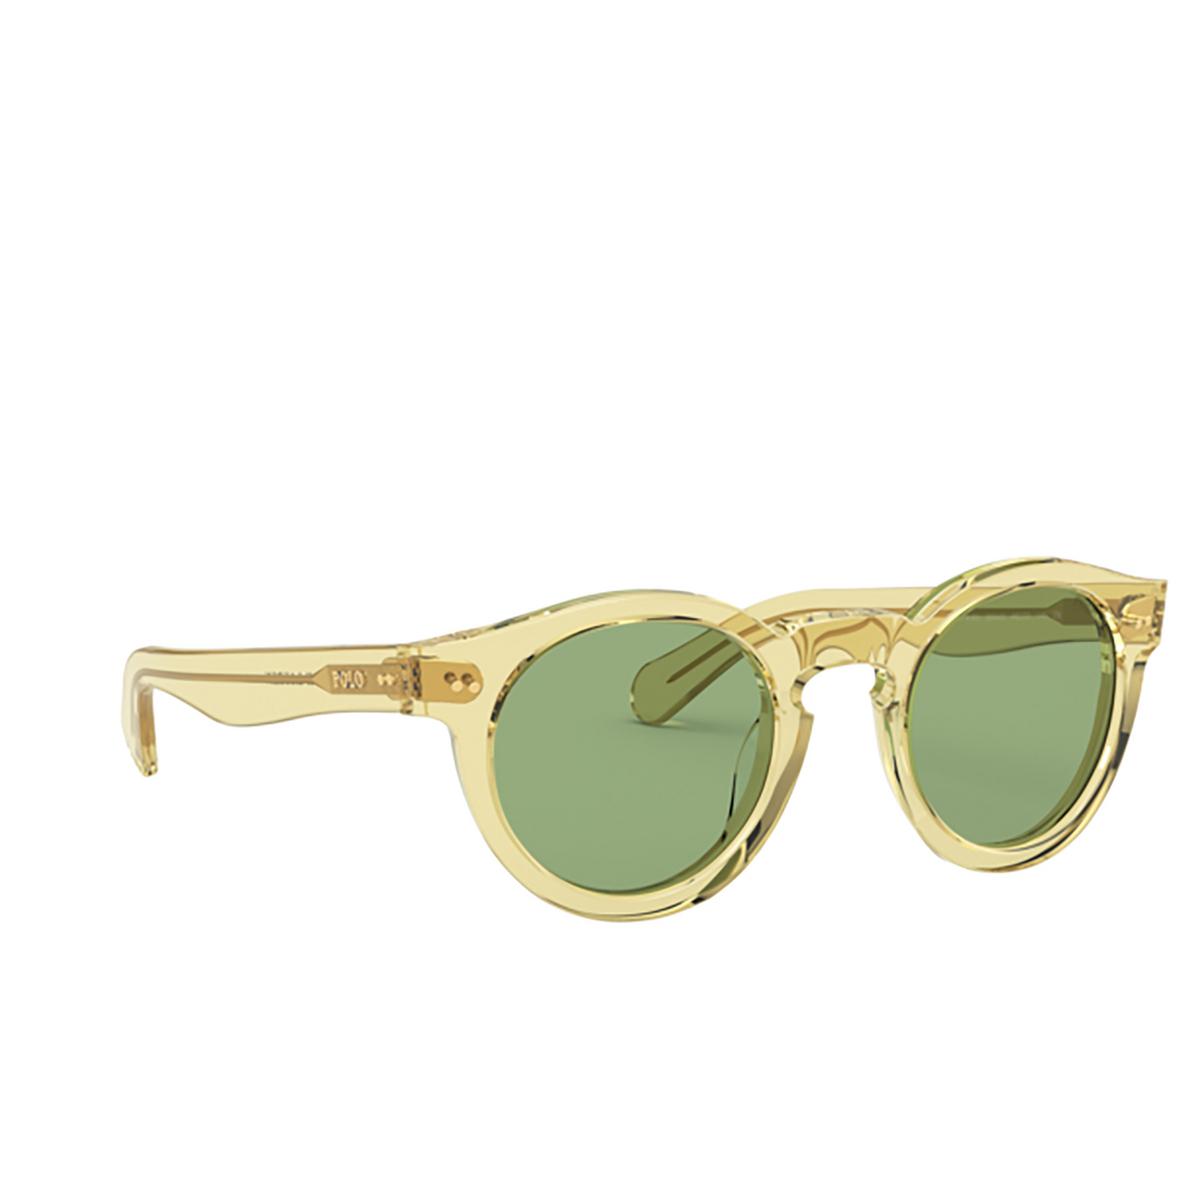 Polo Ralph Lauren® Round Sunglasses: PH4165 color Shiny Transp Dark Grey Pinot 5864/2.